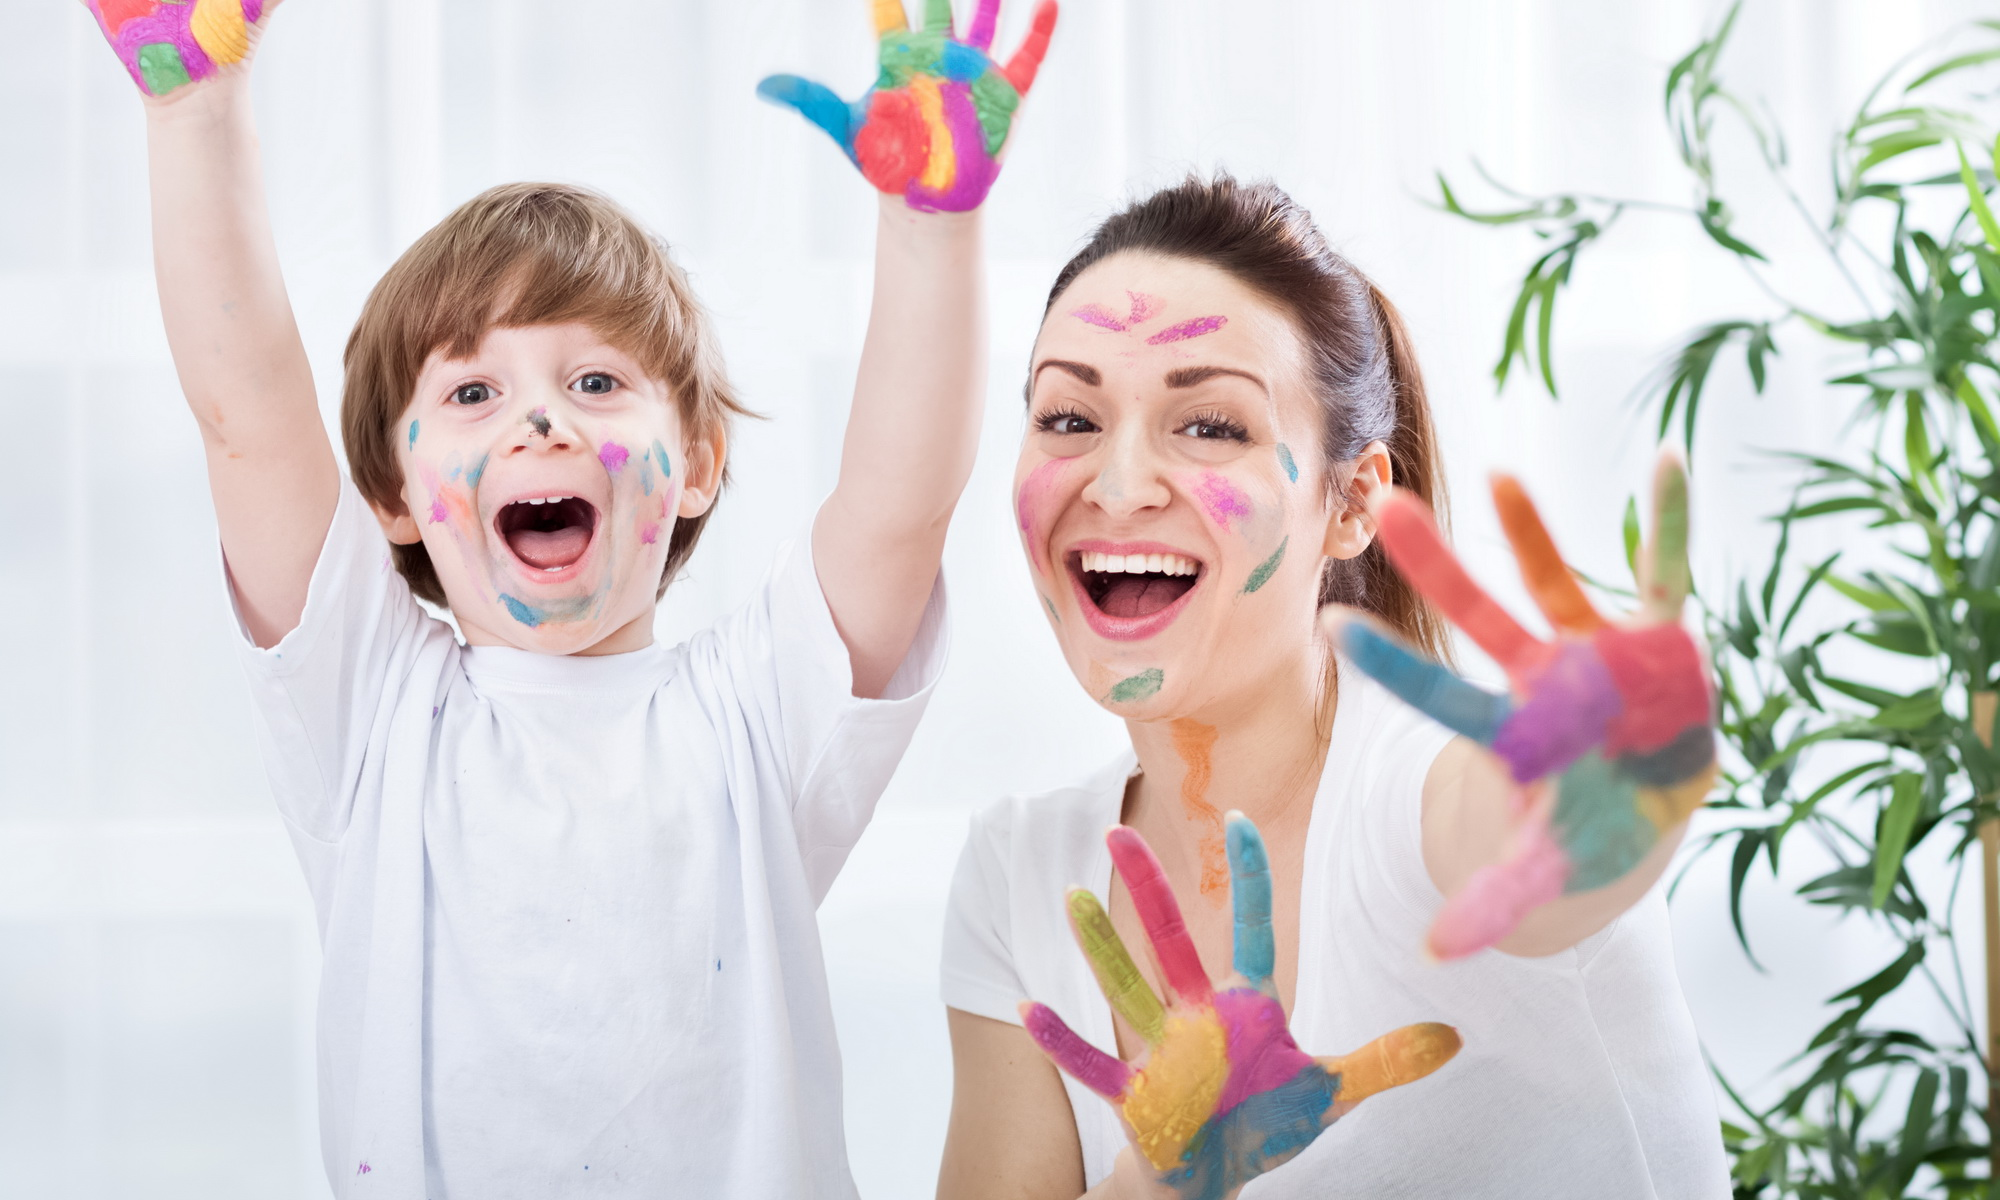 parentcoaching.org